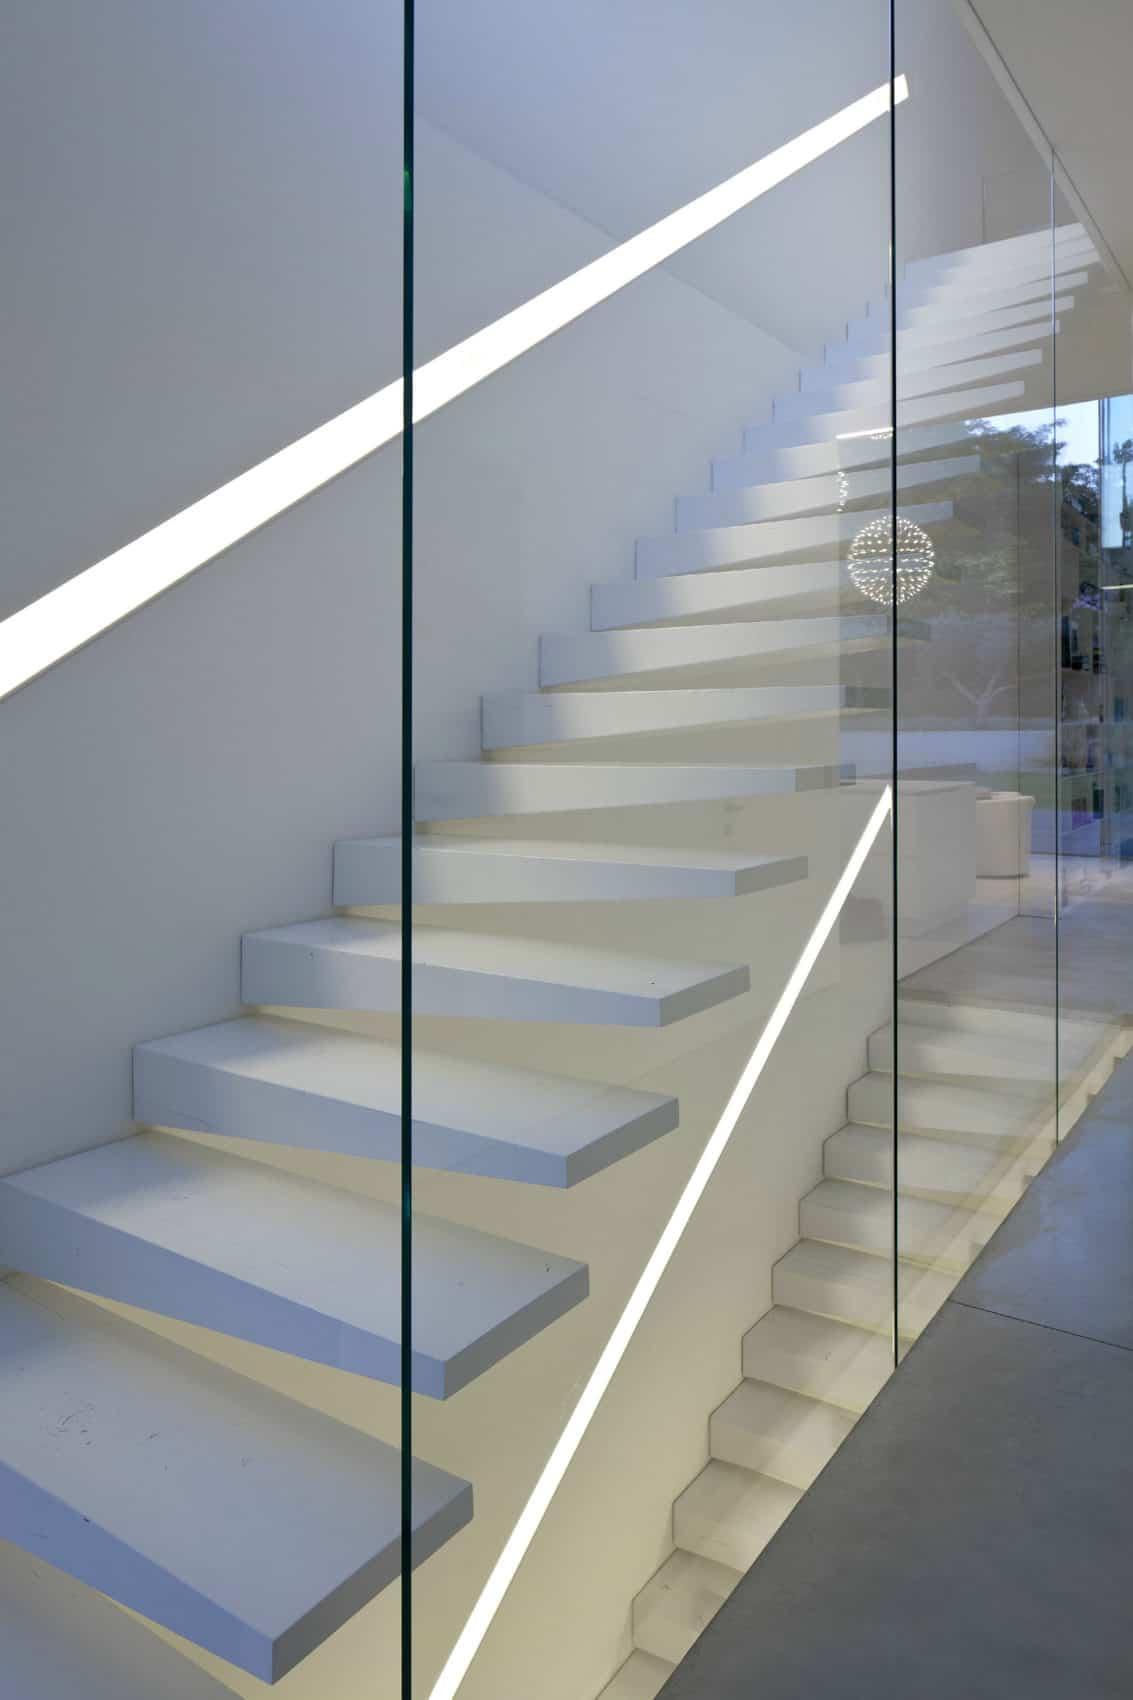 Ramat Hasharon House 13 by Pitsou Kedem Architects (16)